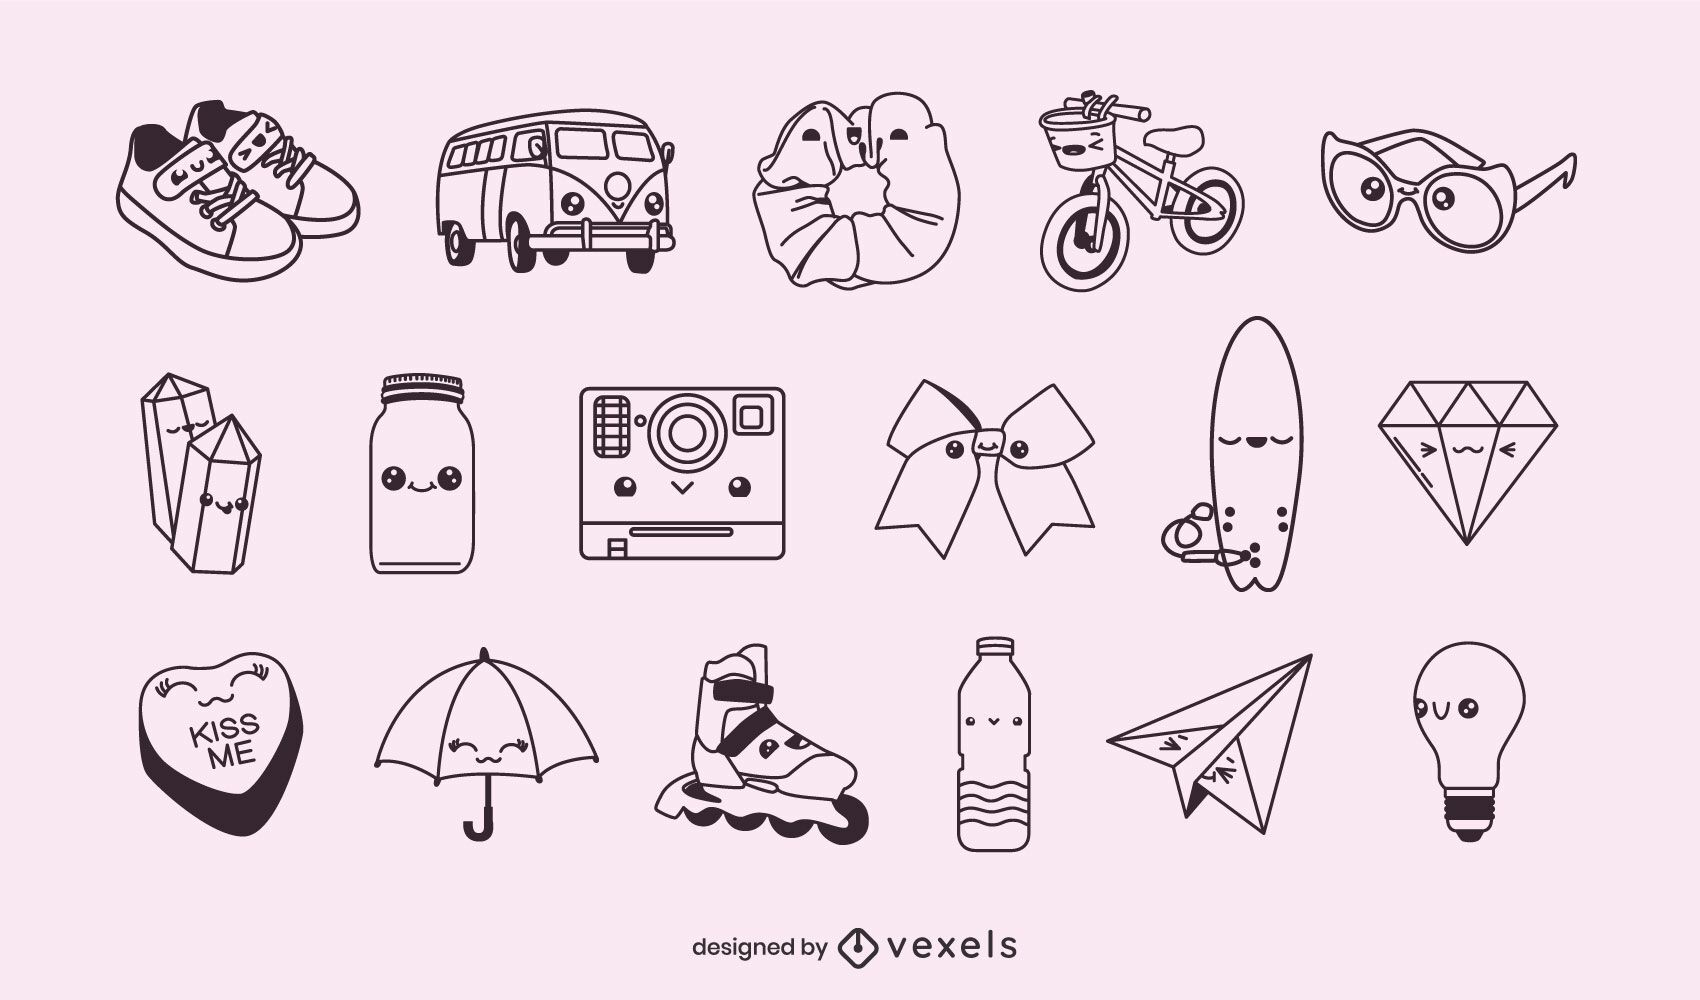 Conjunto de objetos kawaii de trazo misceláneo